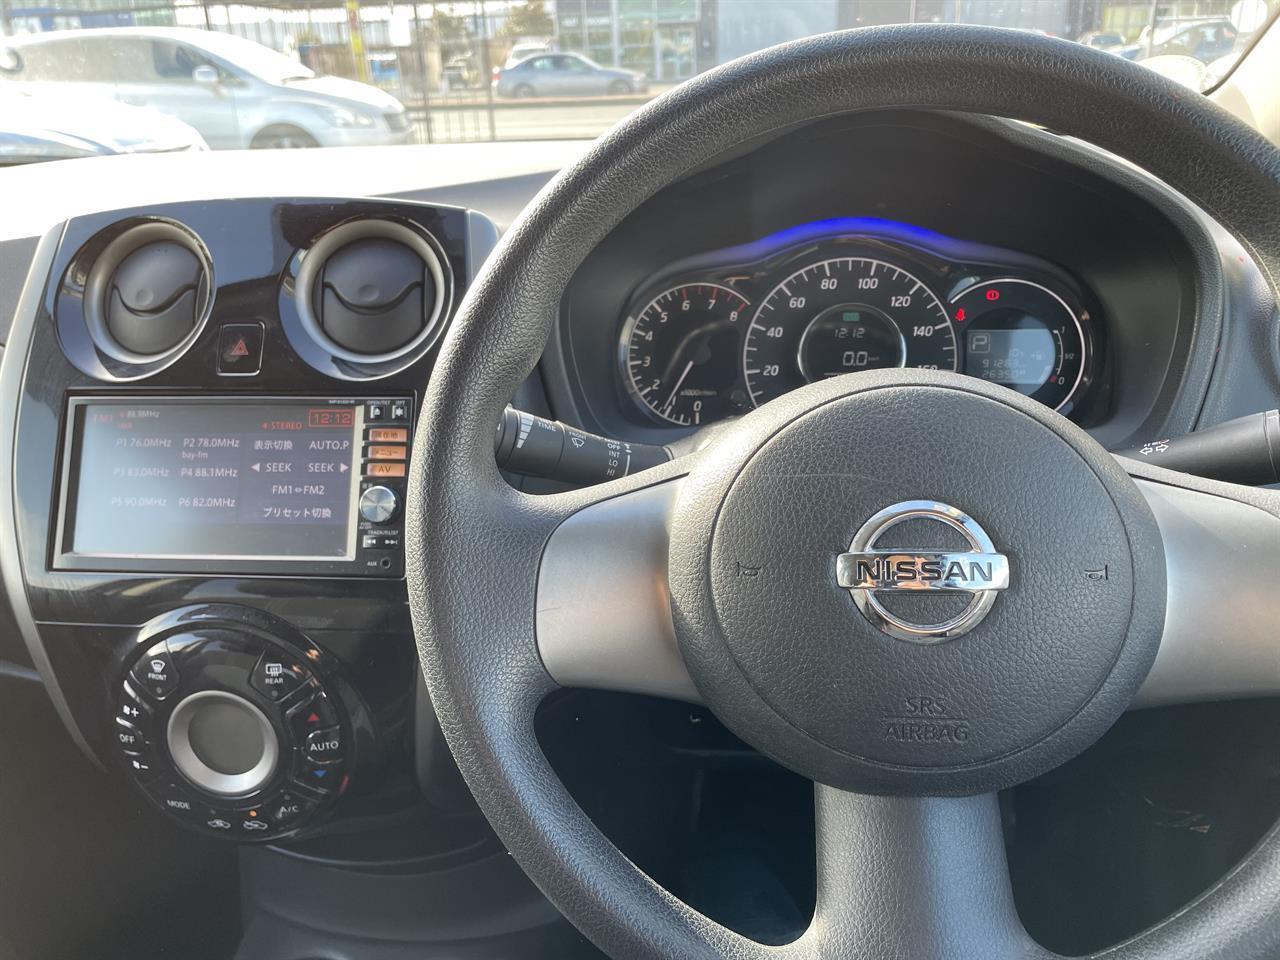 image-10, 2013 Nissan Note at Christchurch